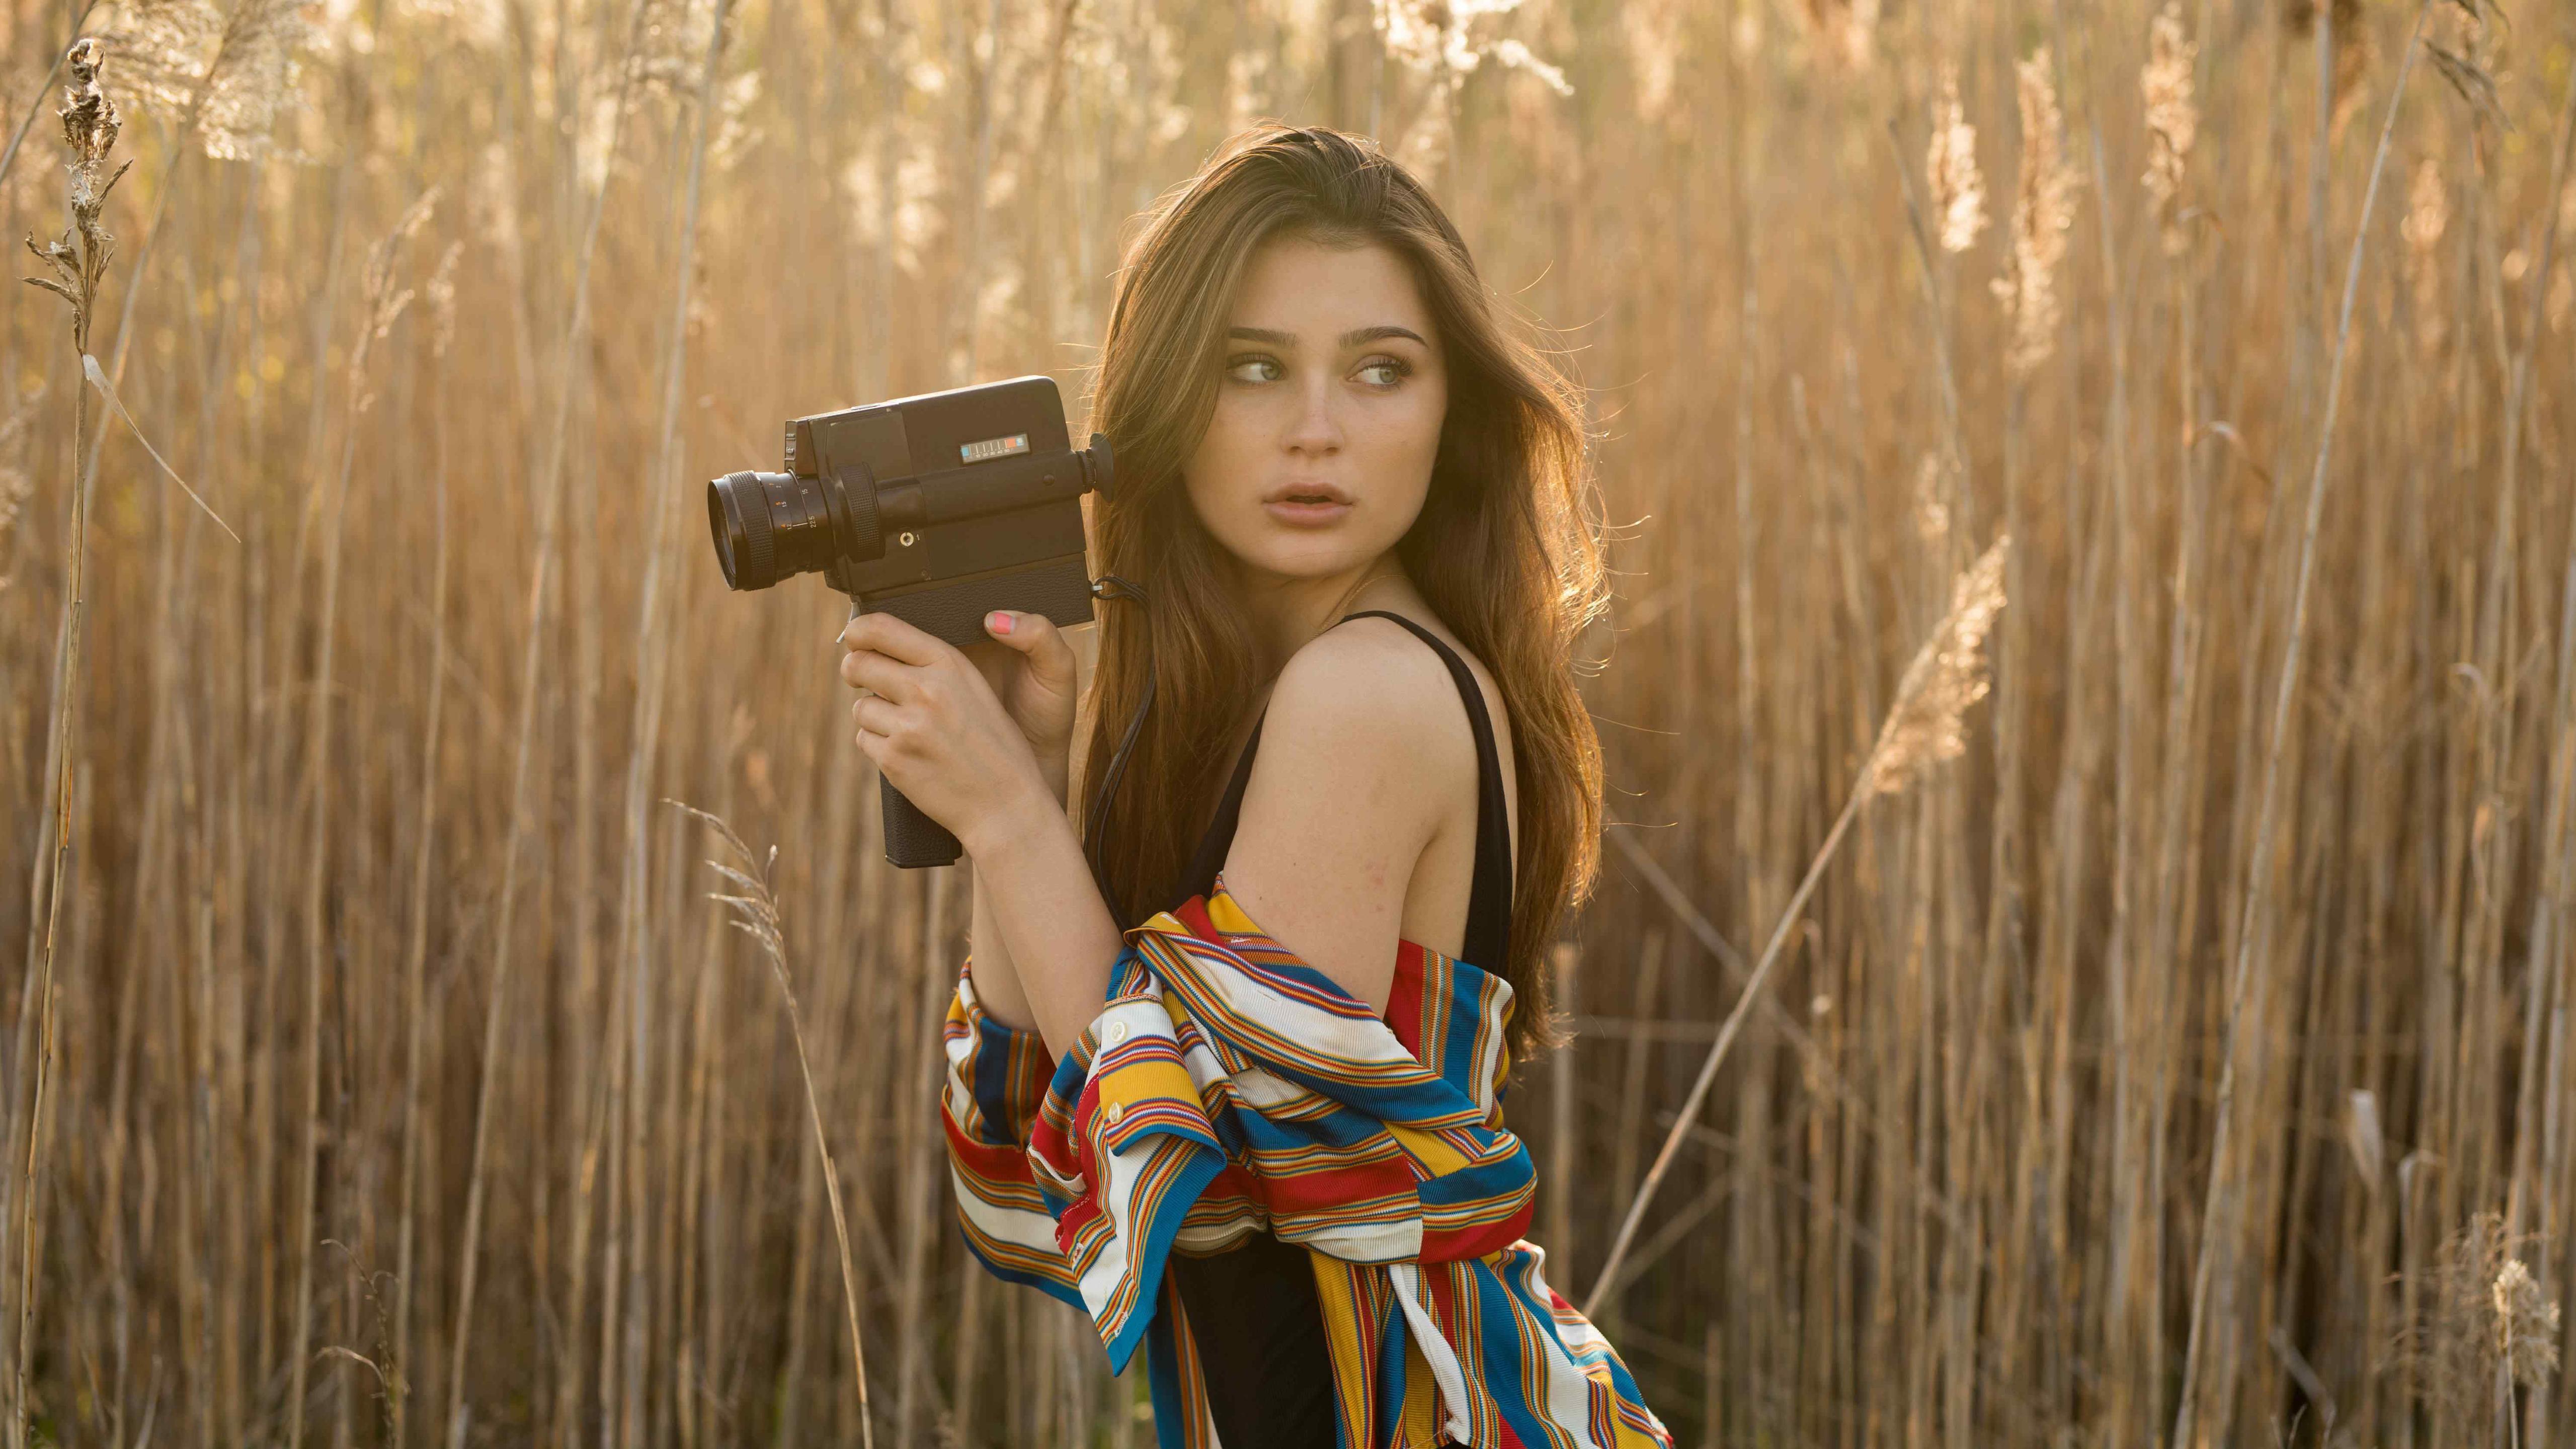 brunette-girl-in-field-with-camera-12.jpg